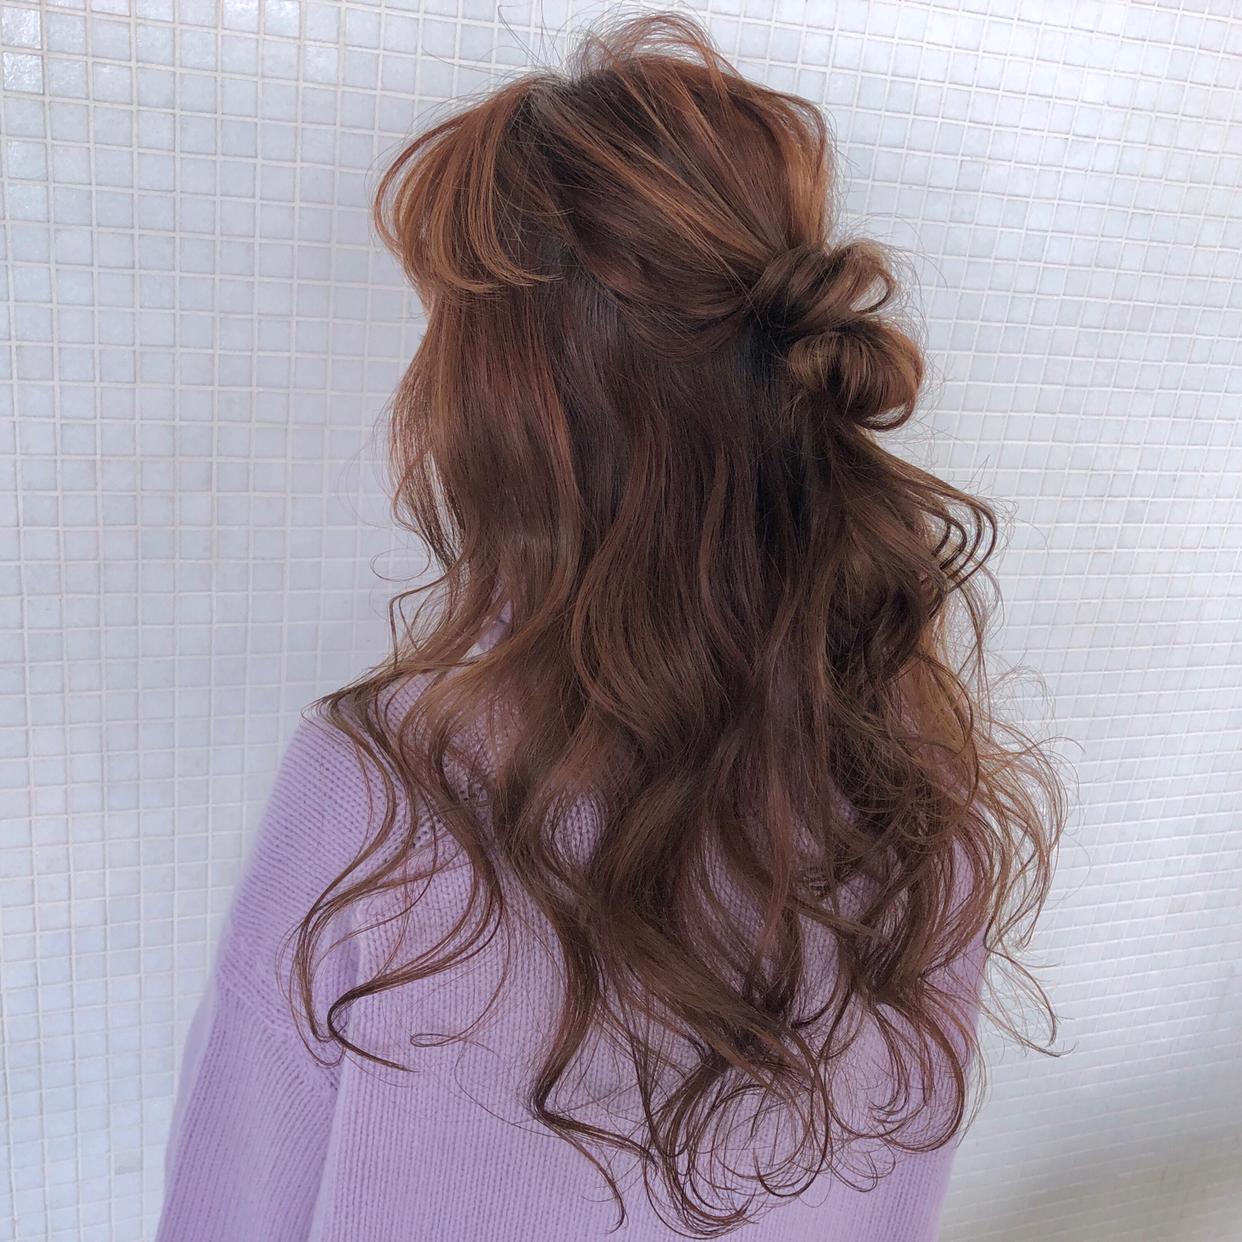 kawamura_takashi_cam ロングのハーフアップ ヘアアレンジ&ヘアセット 河村タカシ #hairarrangecam #hairarrange #hairset #hair #ヘアアレンジ #へアセット #ヘア #関西 #大阪 #心斎橋 #hairdresser #美容師 #サロンモデル募集 #サロモ #おくれ毛 #簡単ヘアアレンジ